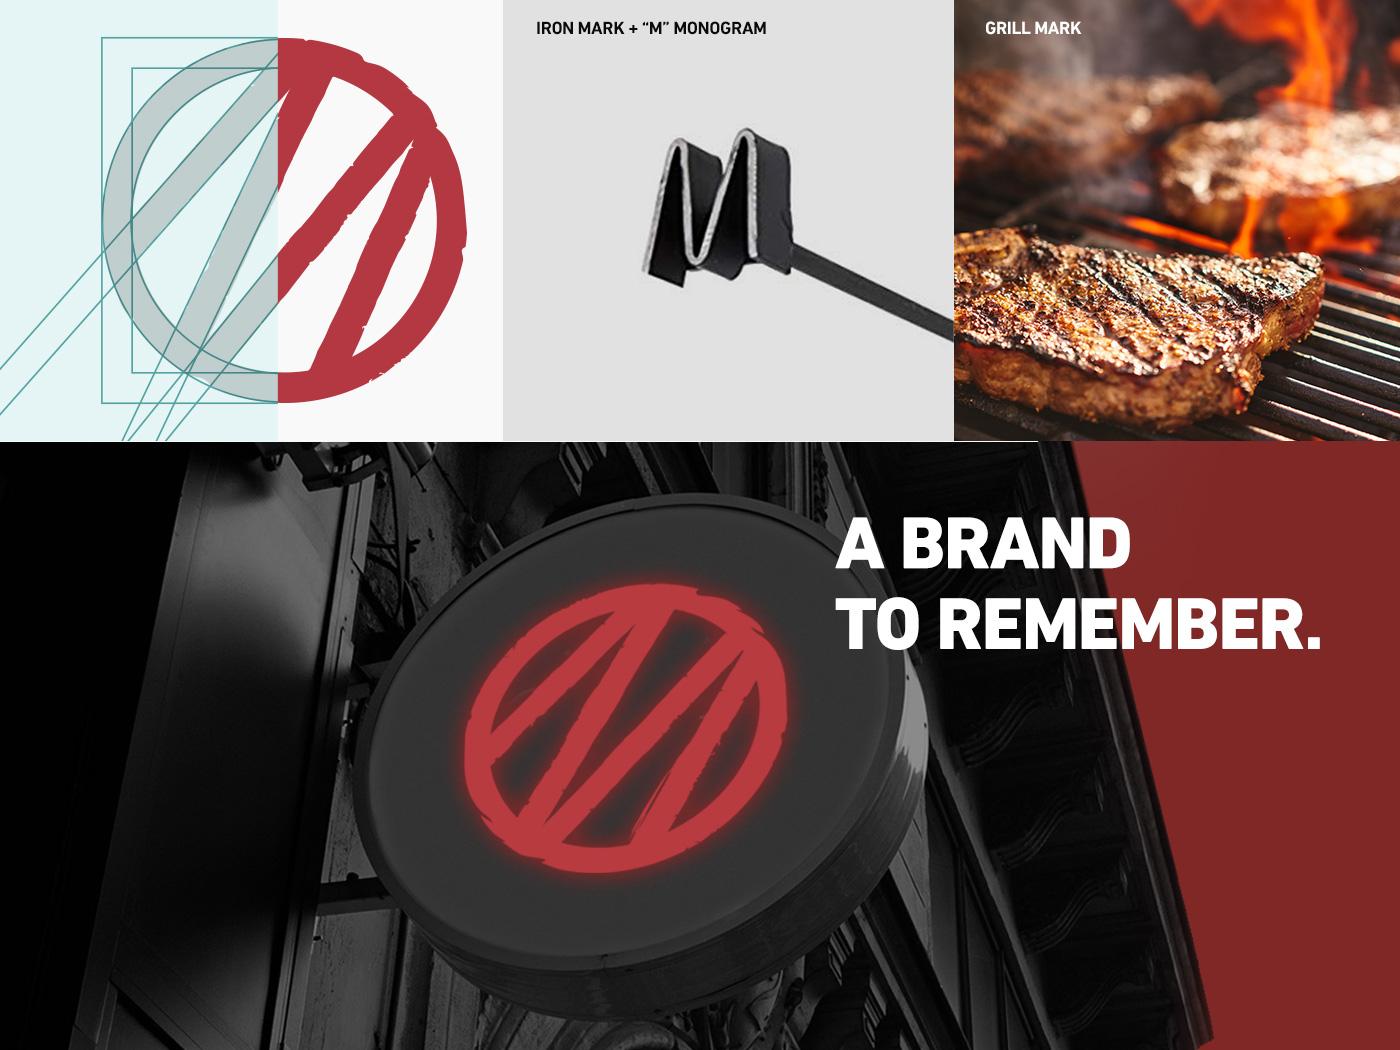 Mondiola   Branding monogram asado graphic design food truck restaurant logo illustration identity design brand strategy branding